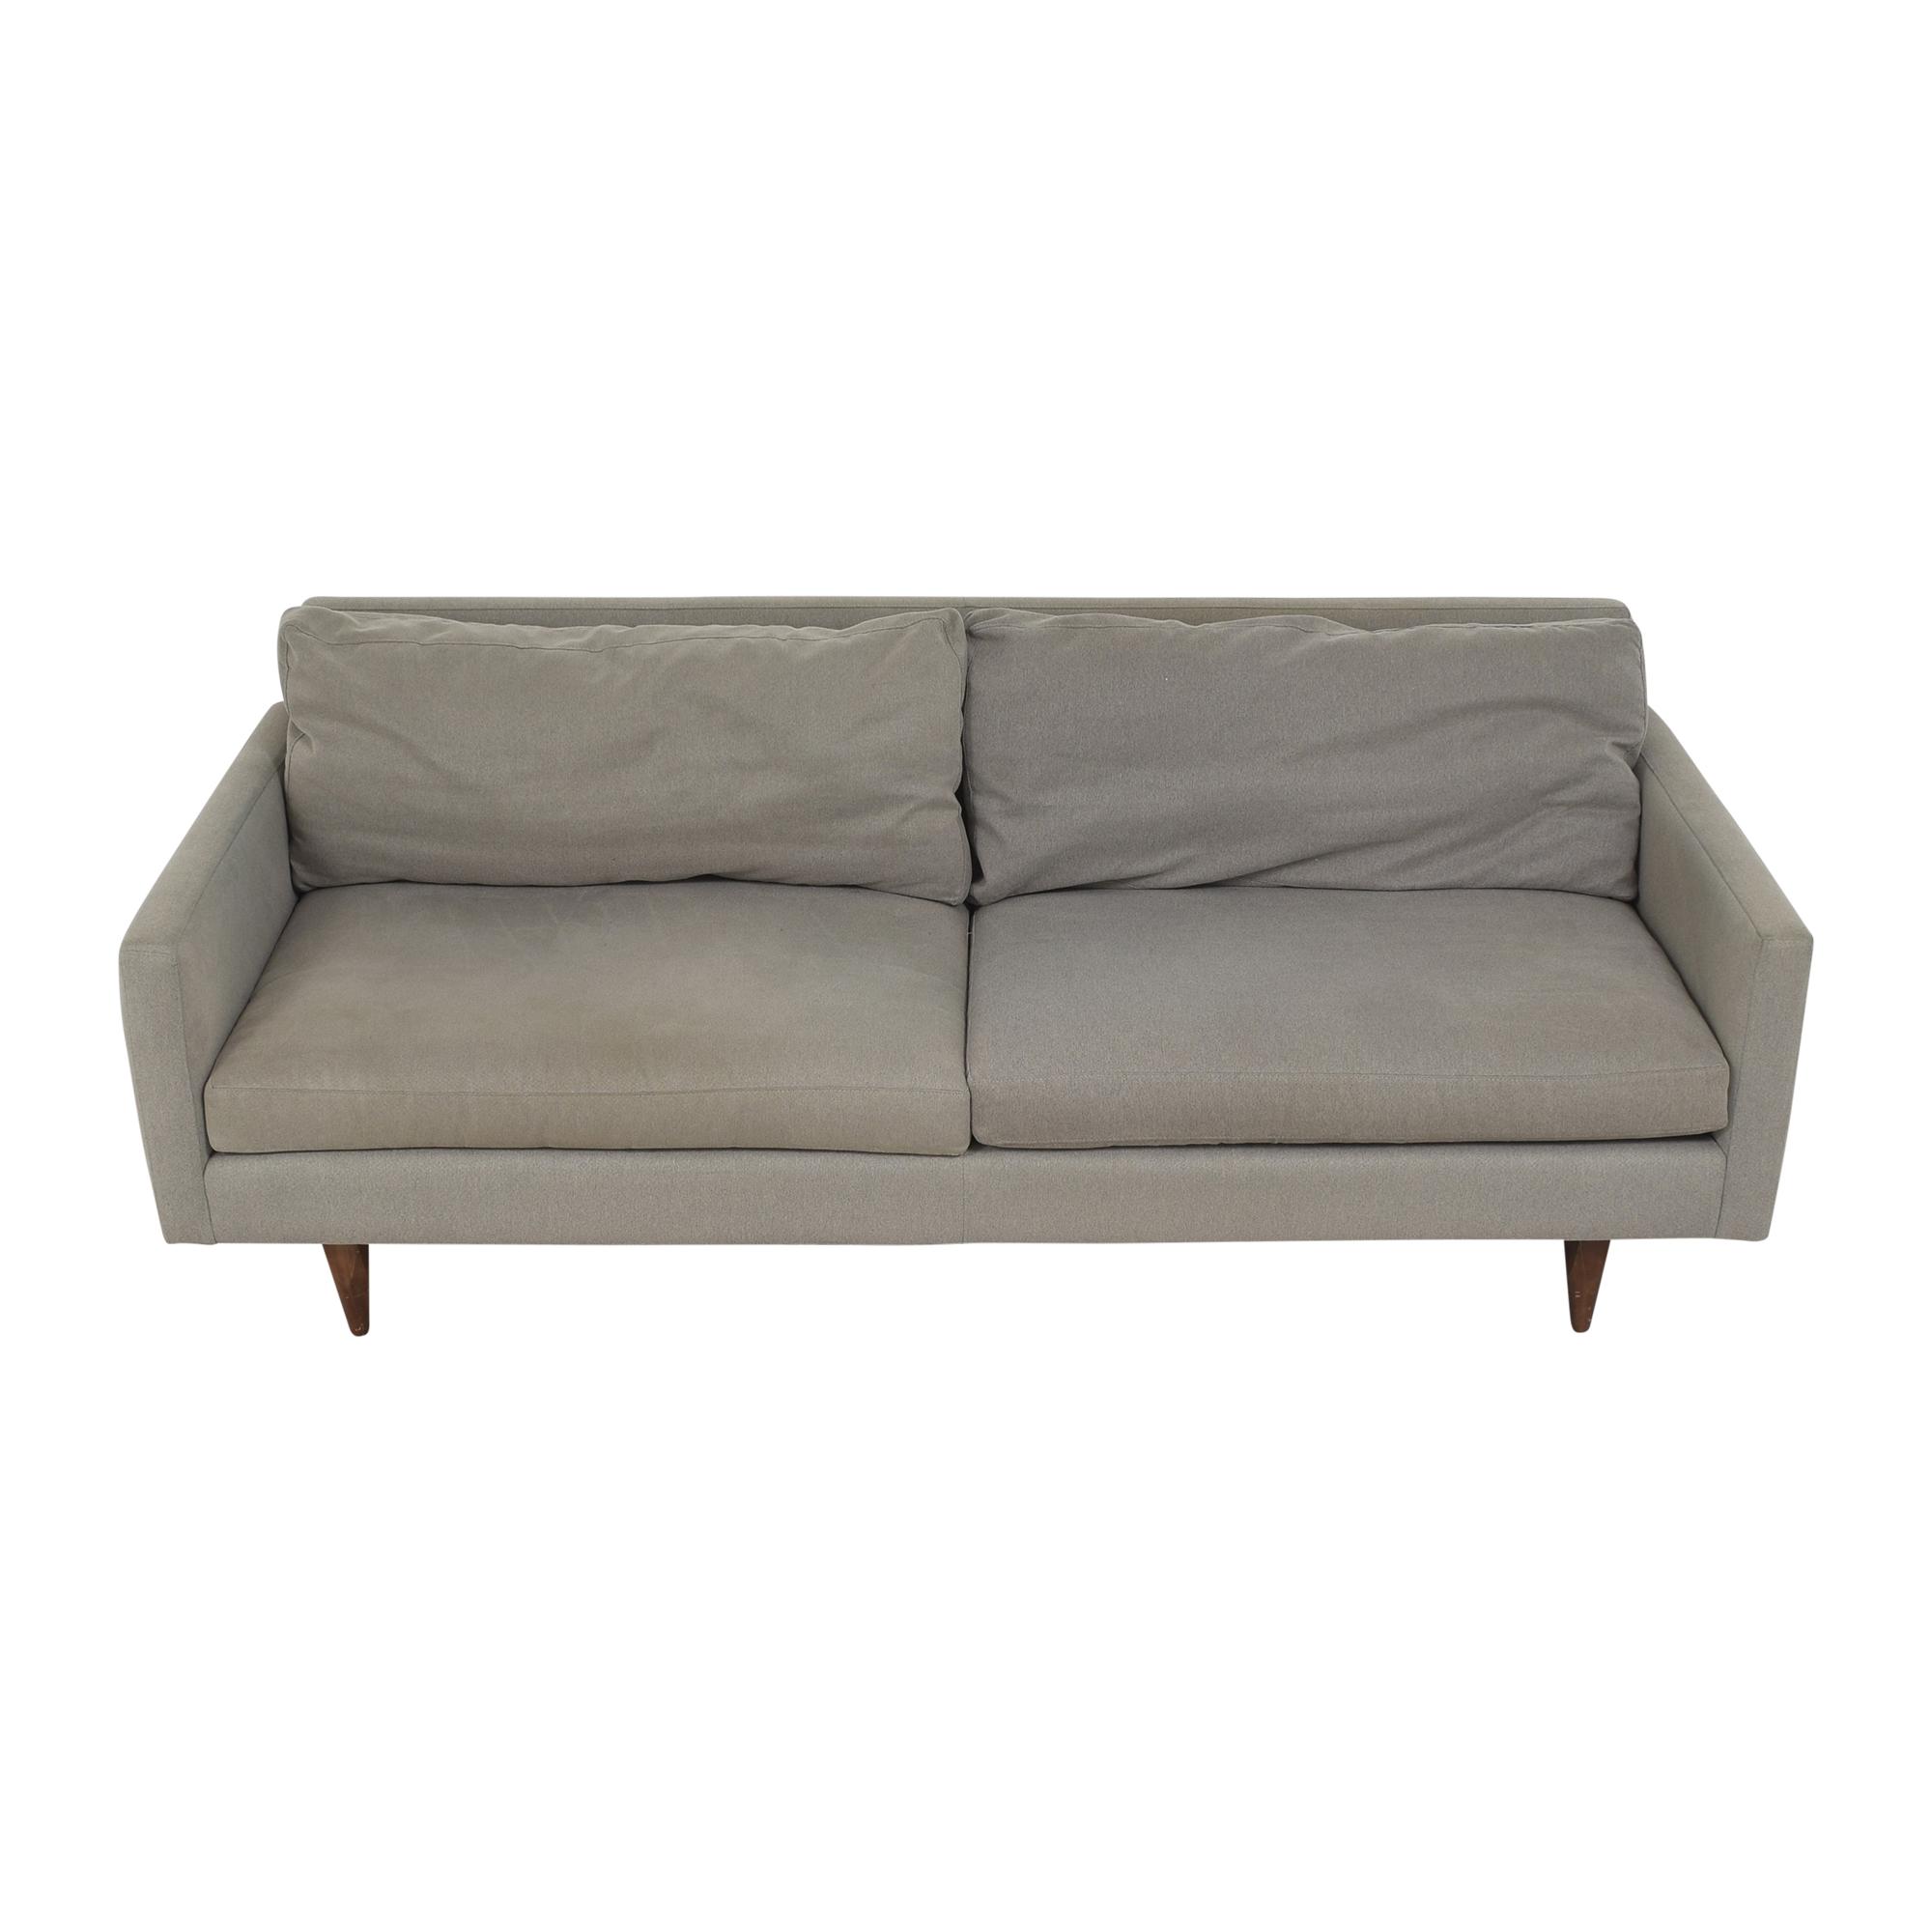 Room & Board Jasper Sofa sale